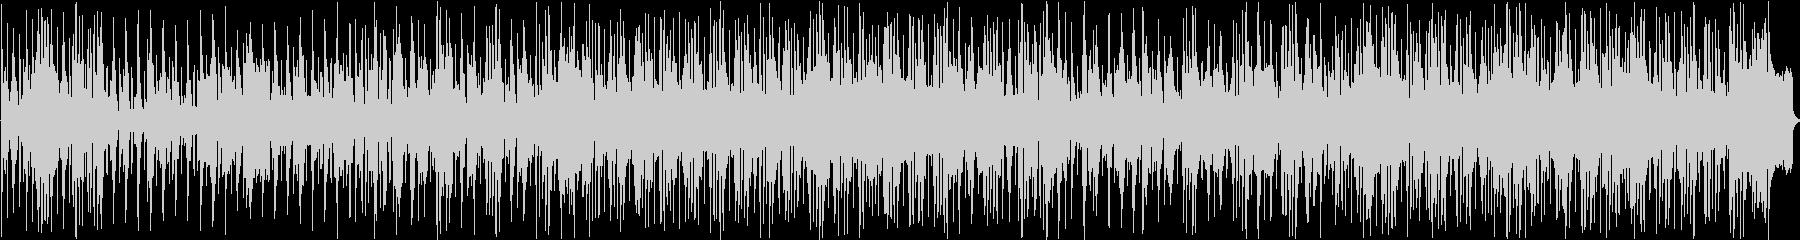 Duo Tumpet&sax、ドラ...の未再生の波形